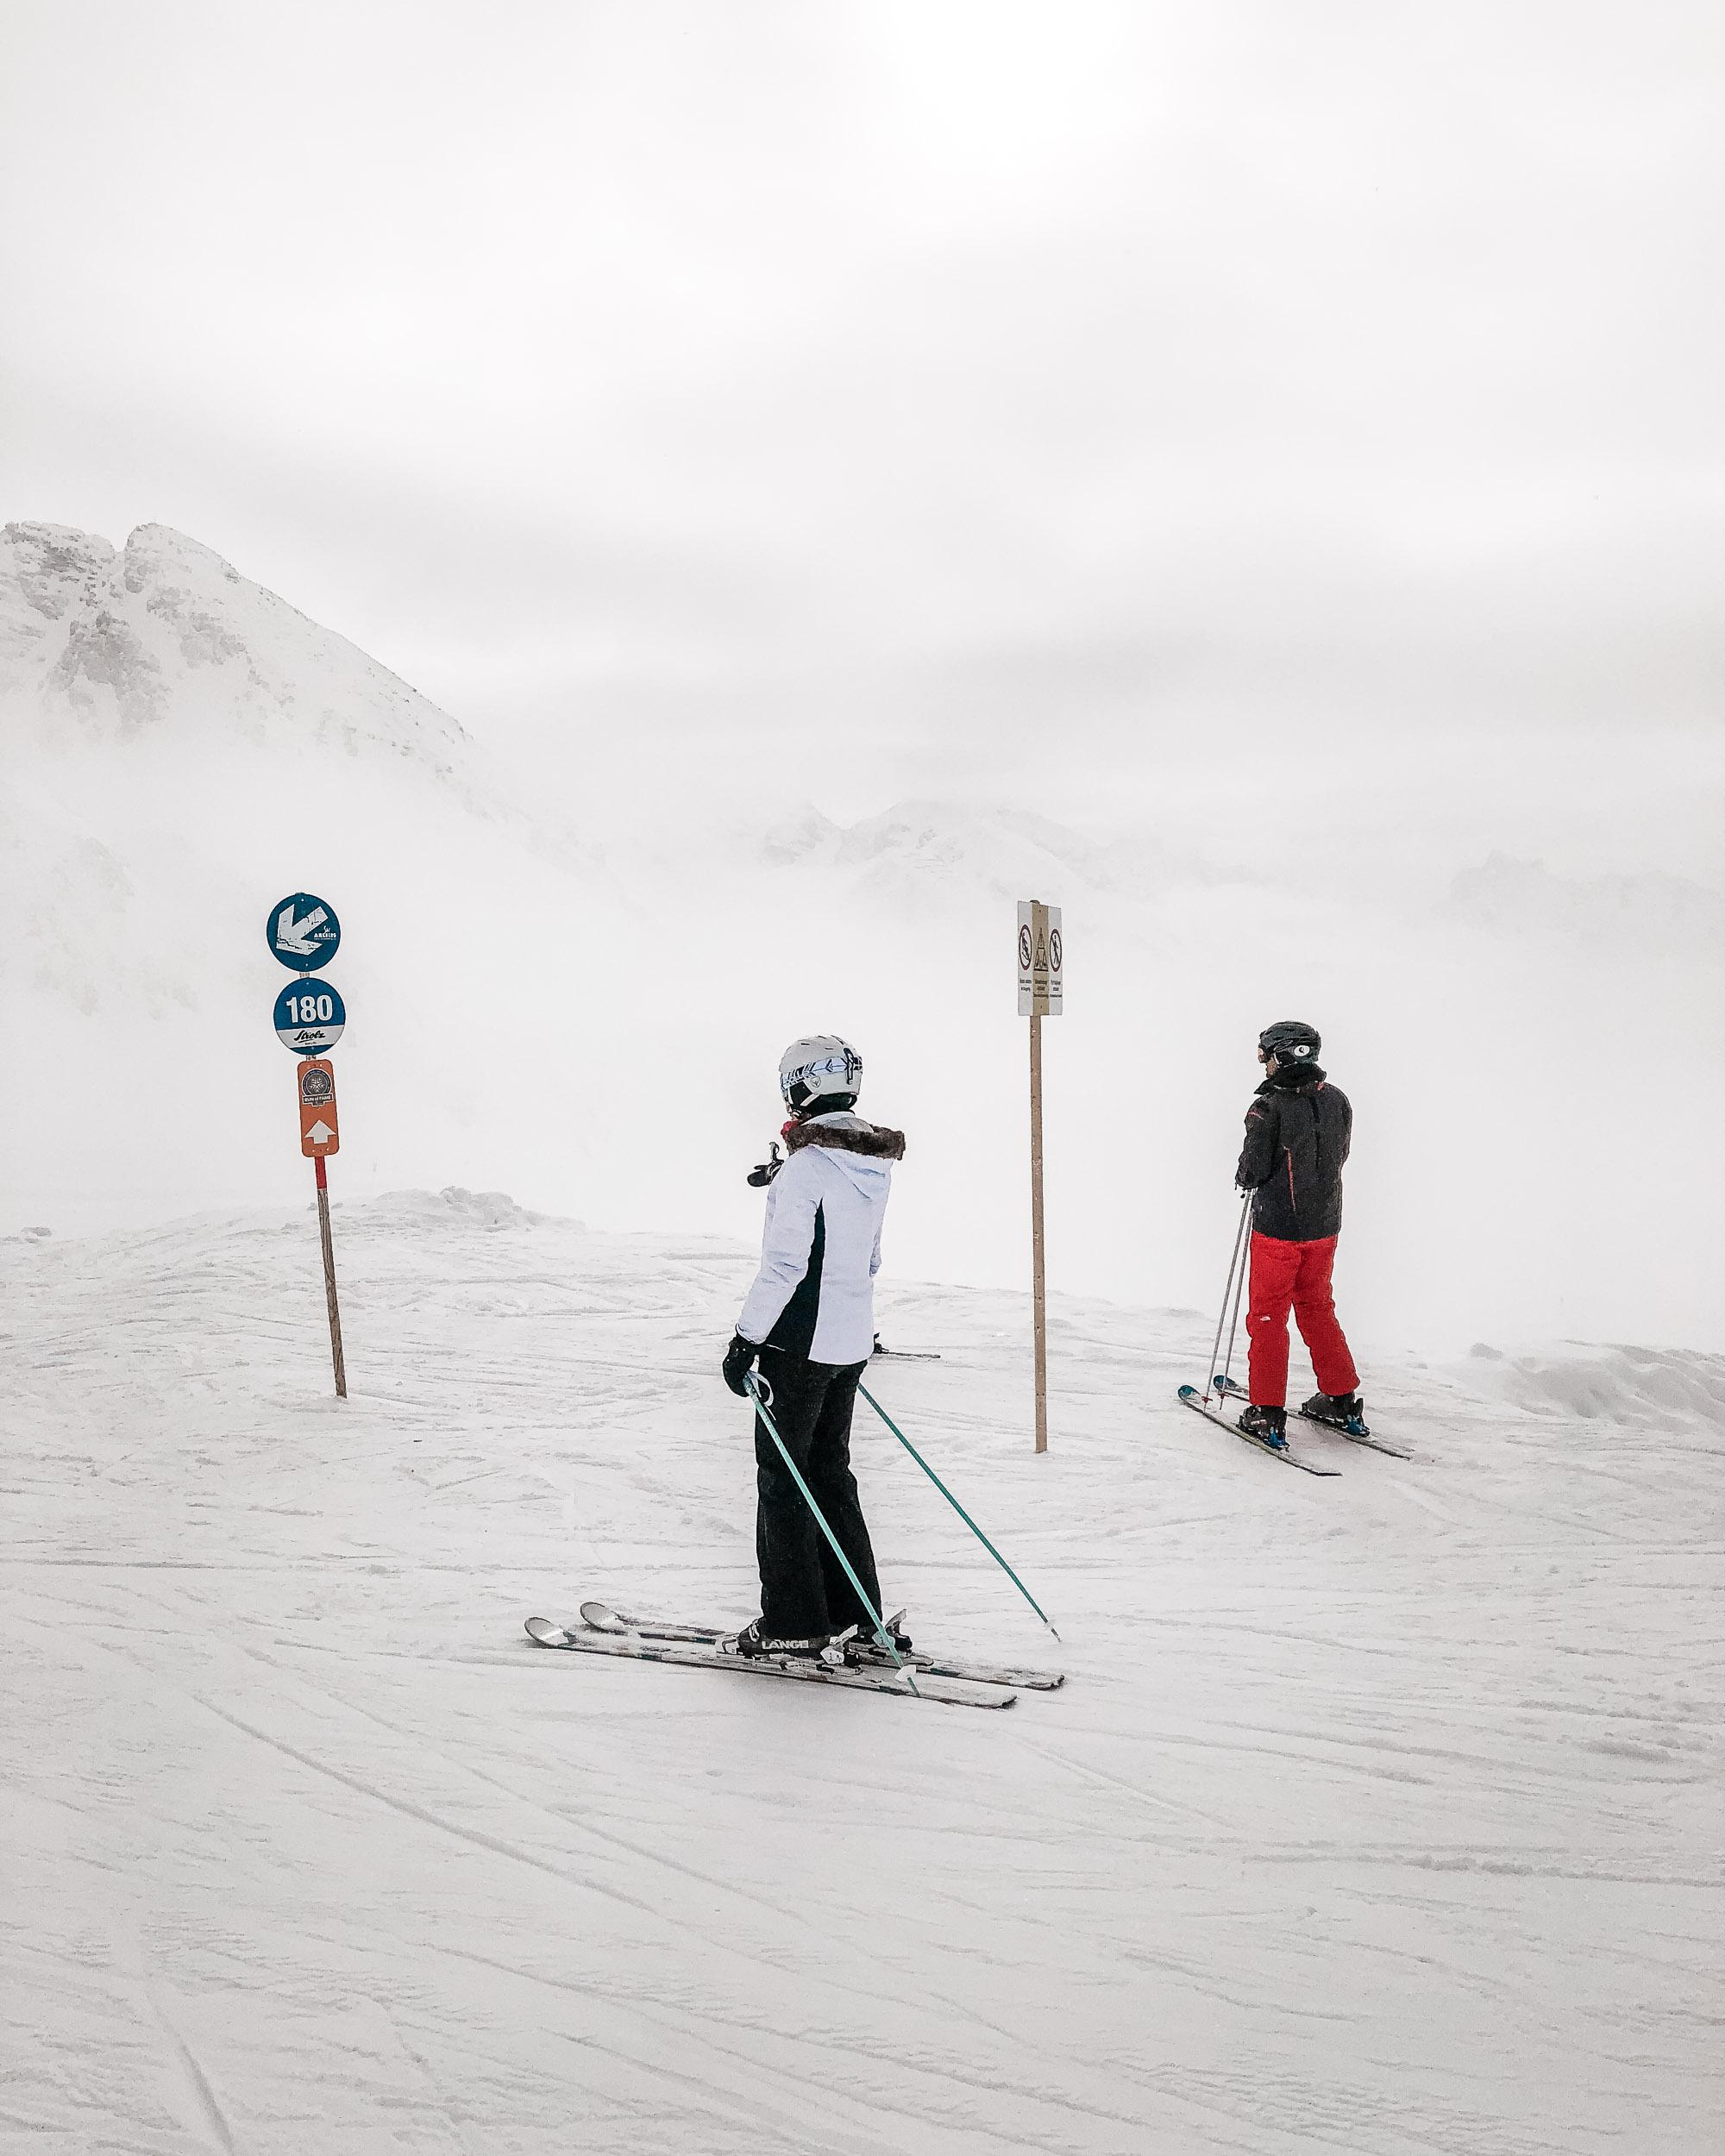 Skiiers in Lech Austria in Europe